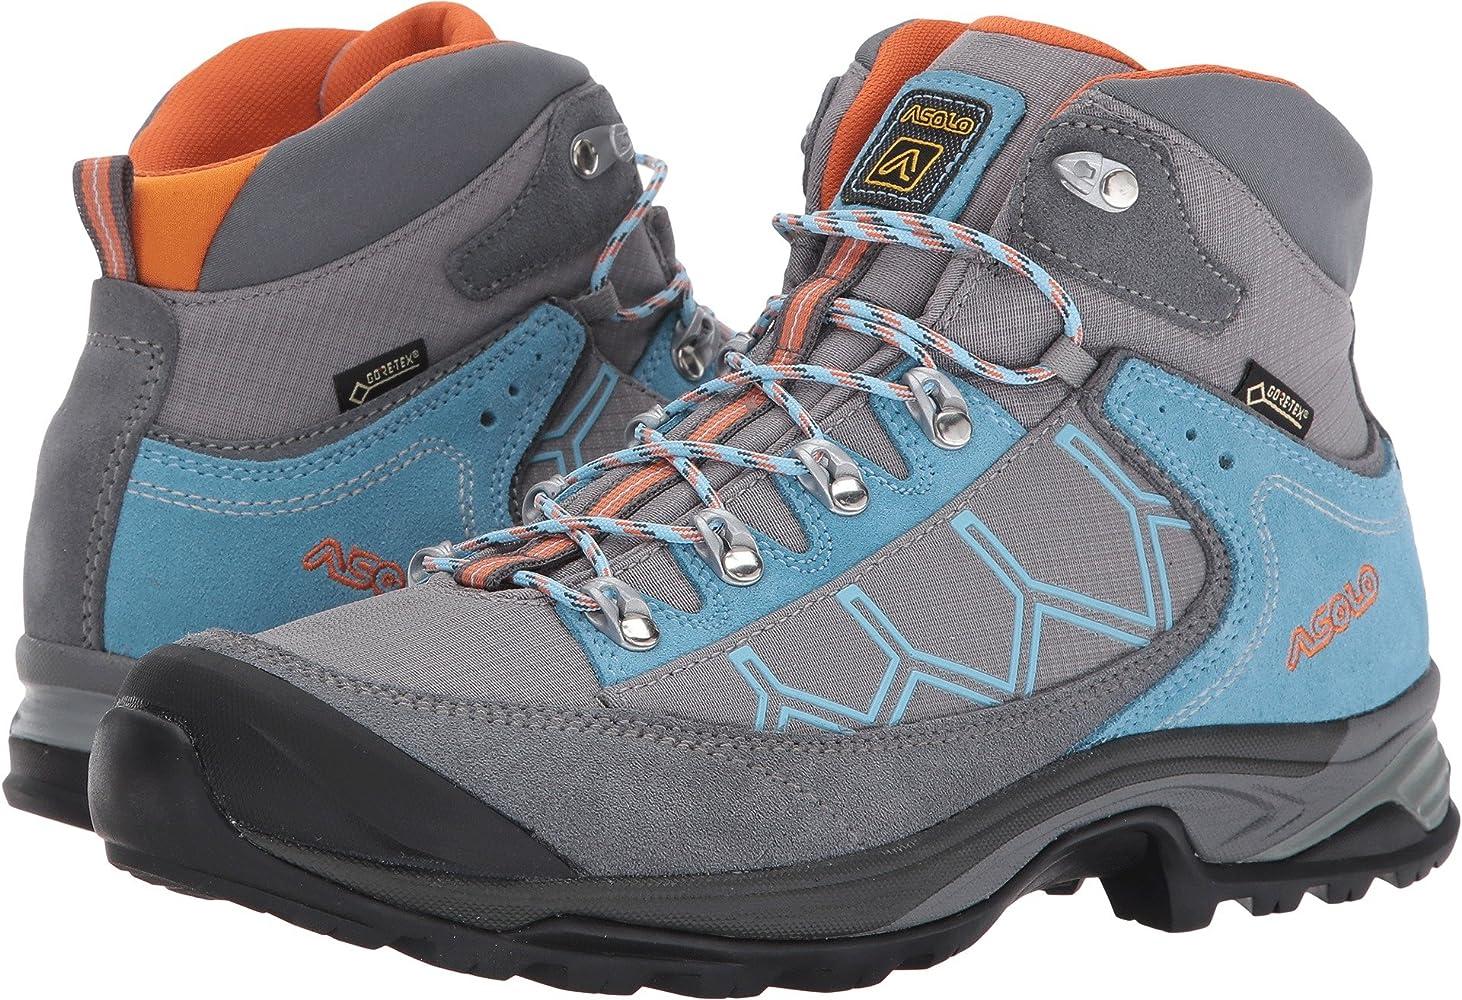 ecff77fc583 Falcon GV GTX Hiking Boot - Womens, Grey/Stone, 10.5, A40017  A40017-Grey/Stone-10.5